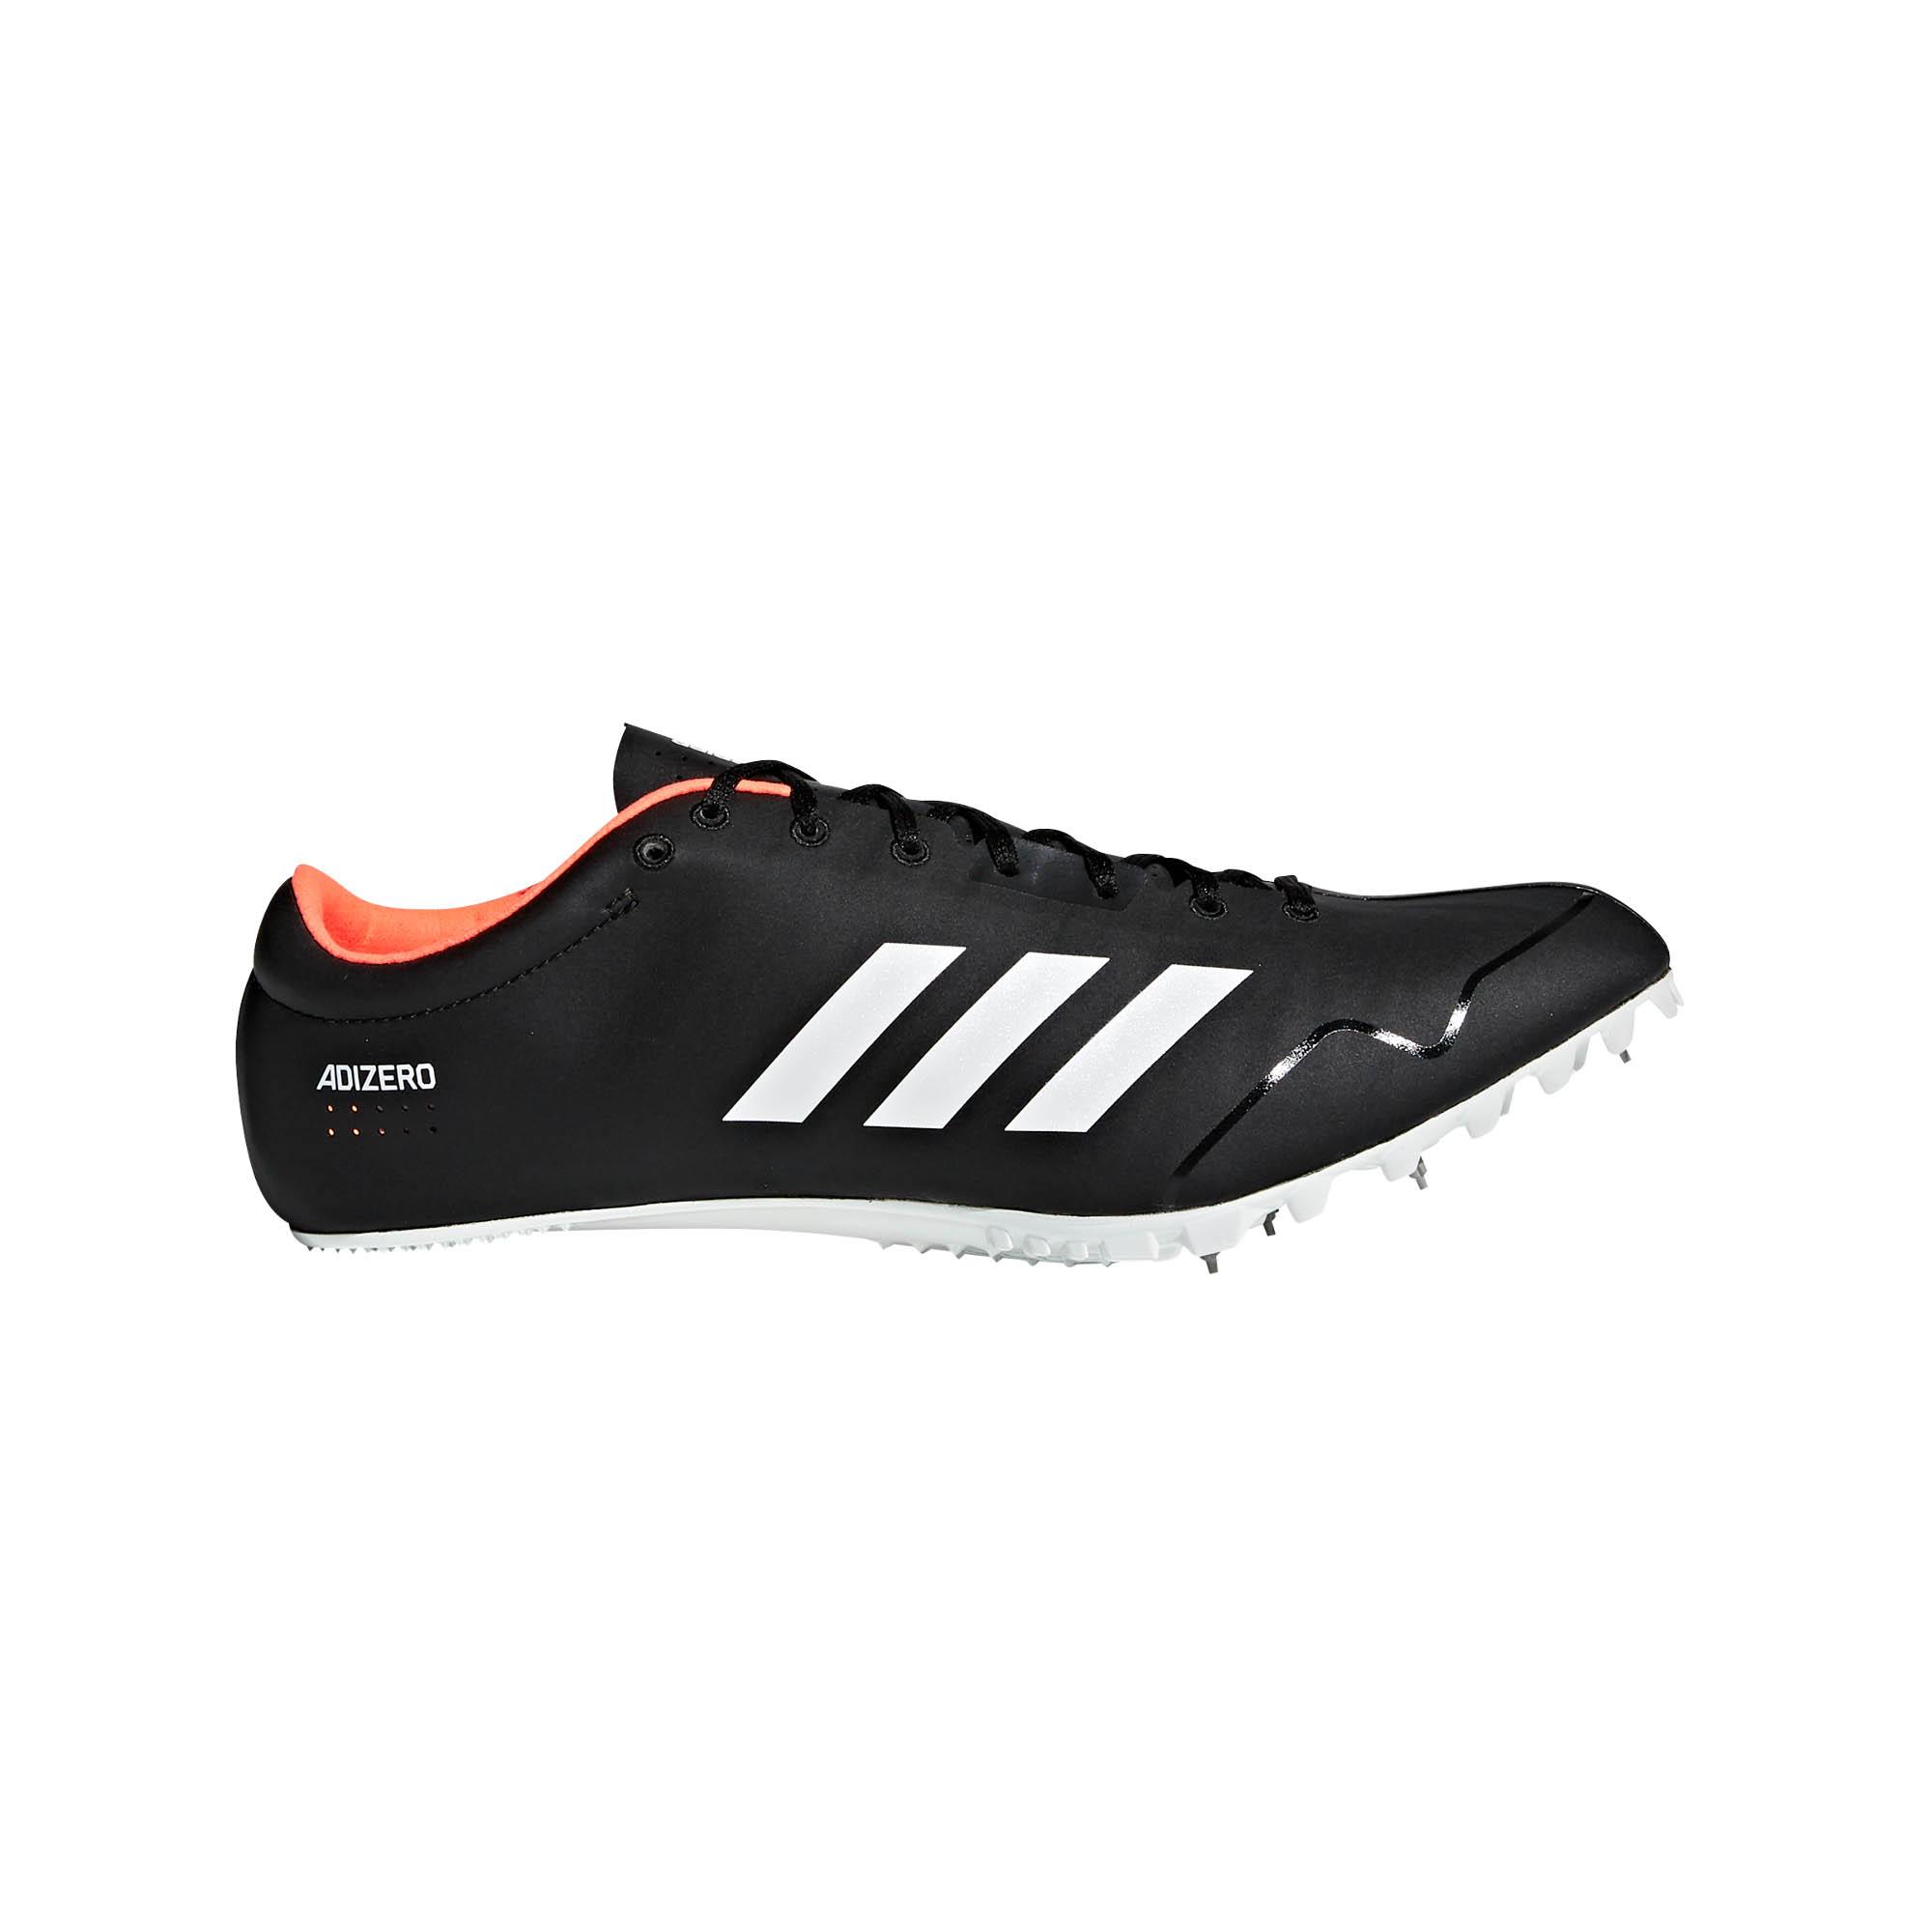 fe2c4e4ef973 Details about adidas adizero Prime Sprint Track   Field Running Spike Shoe  Black